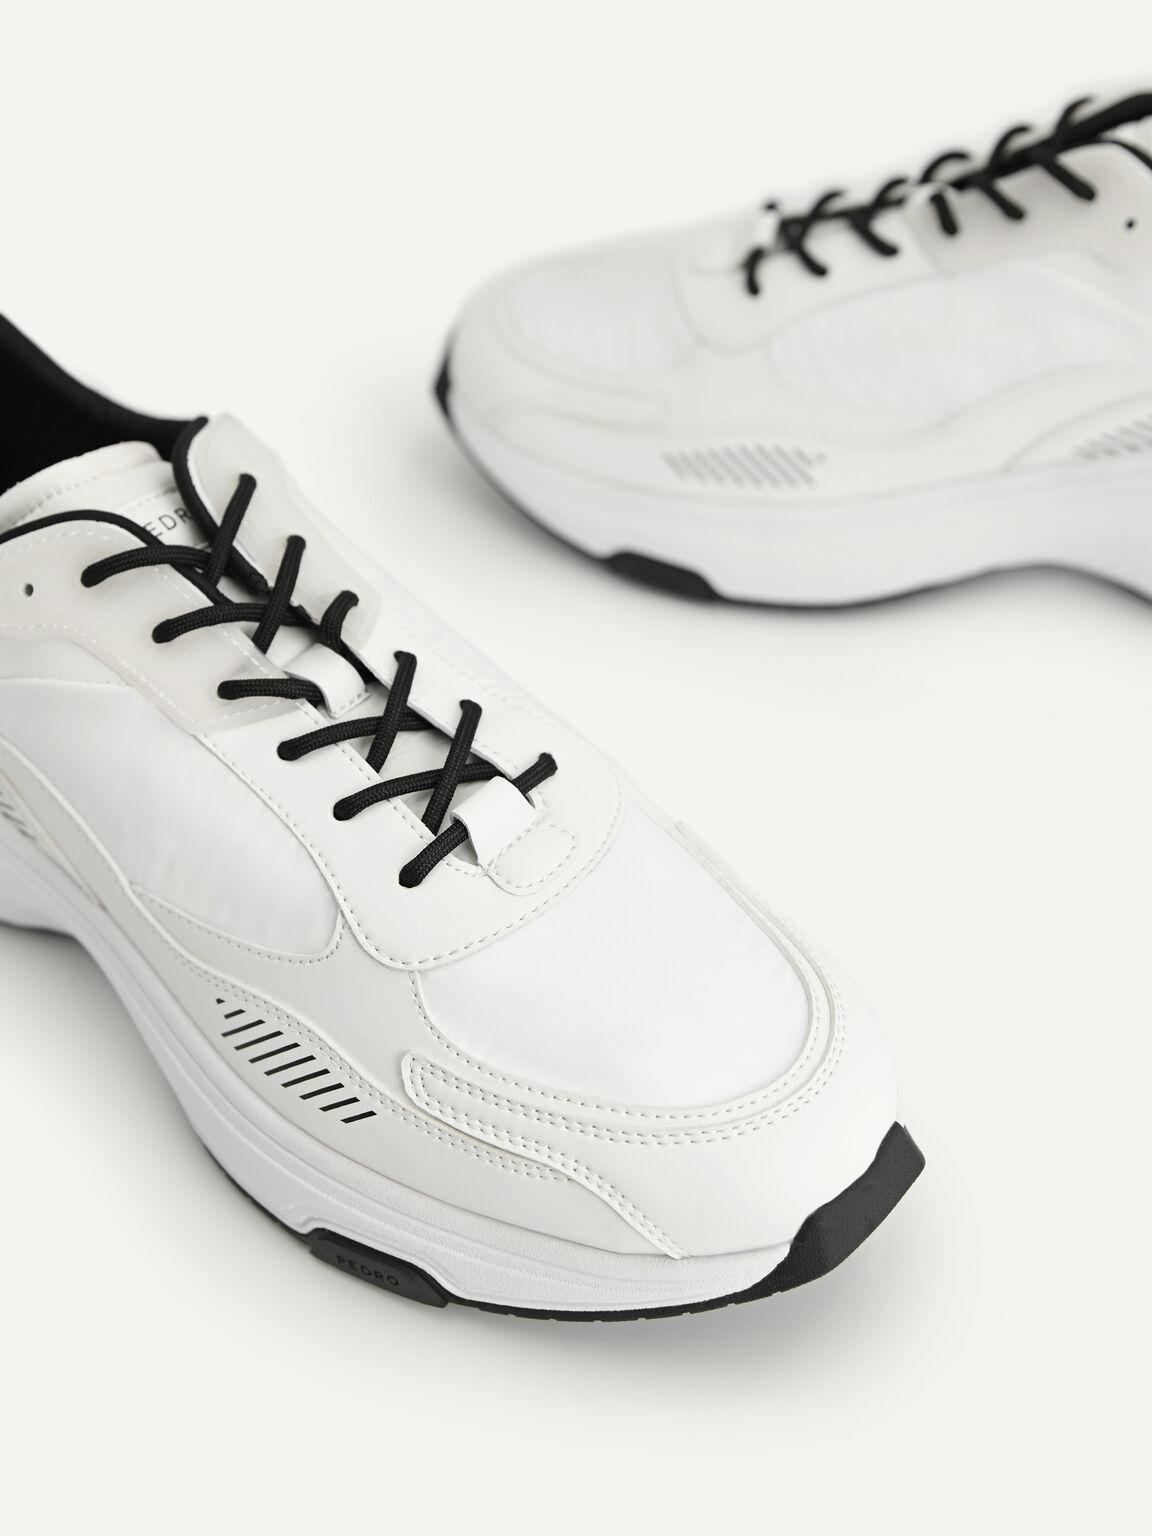 Chunky Sneakers, White, hi-res